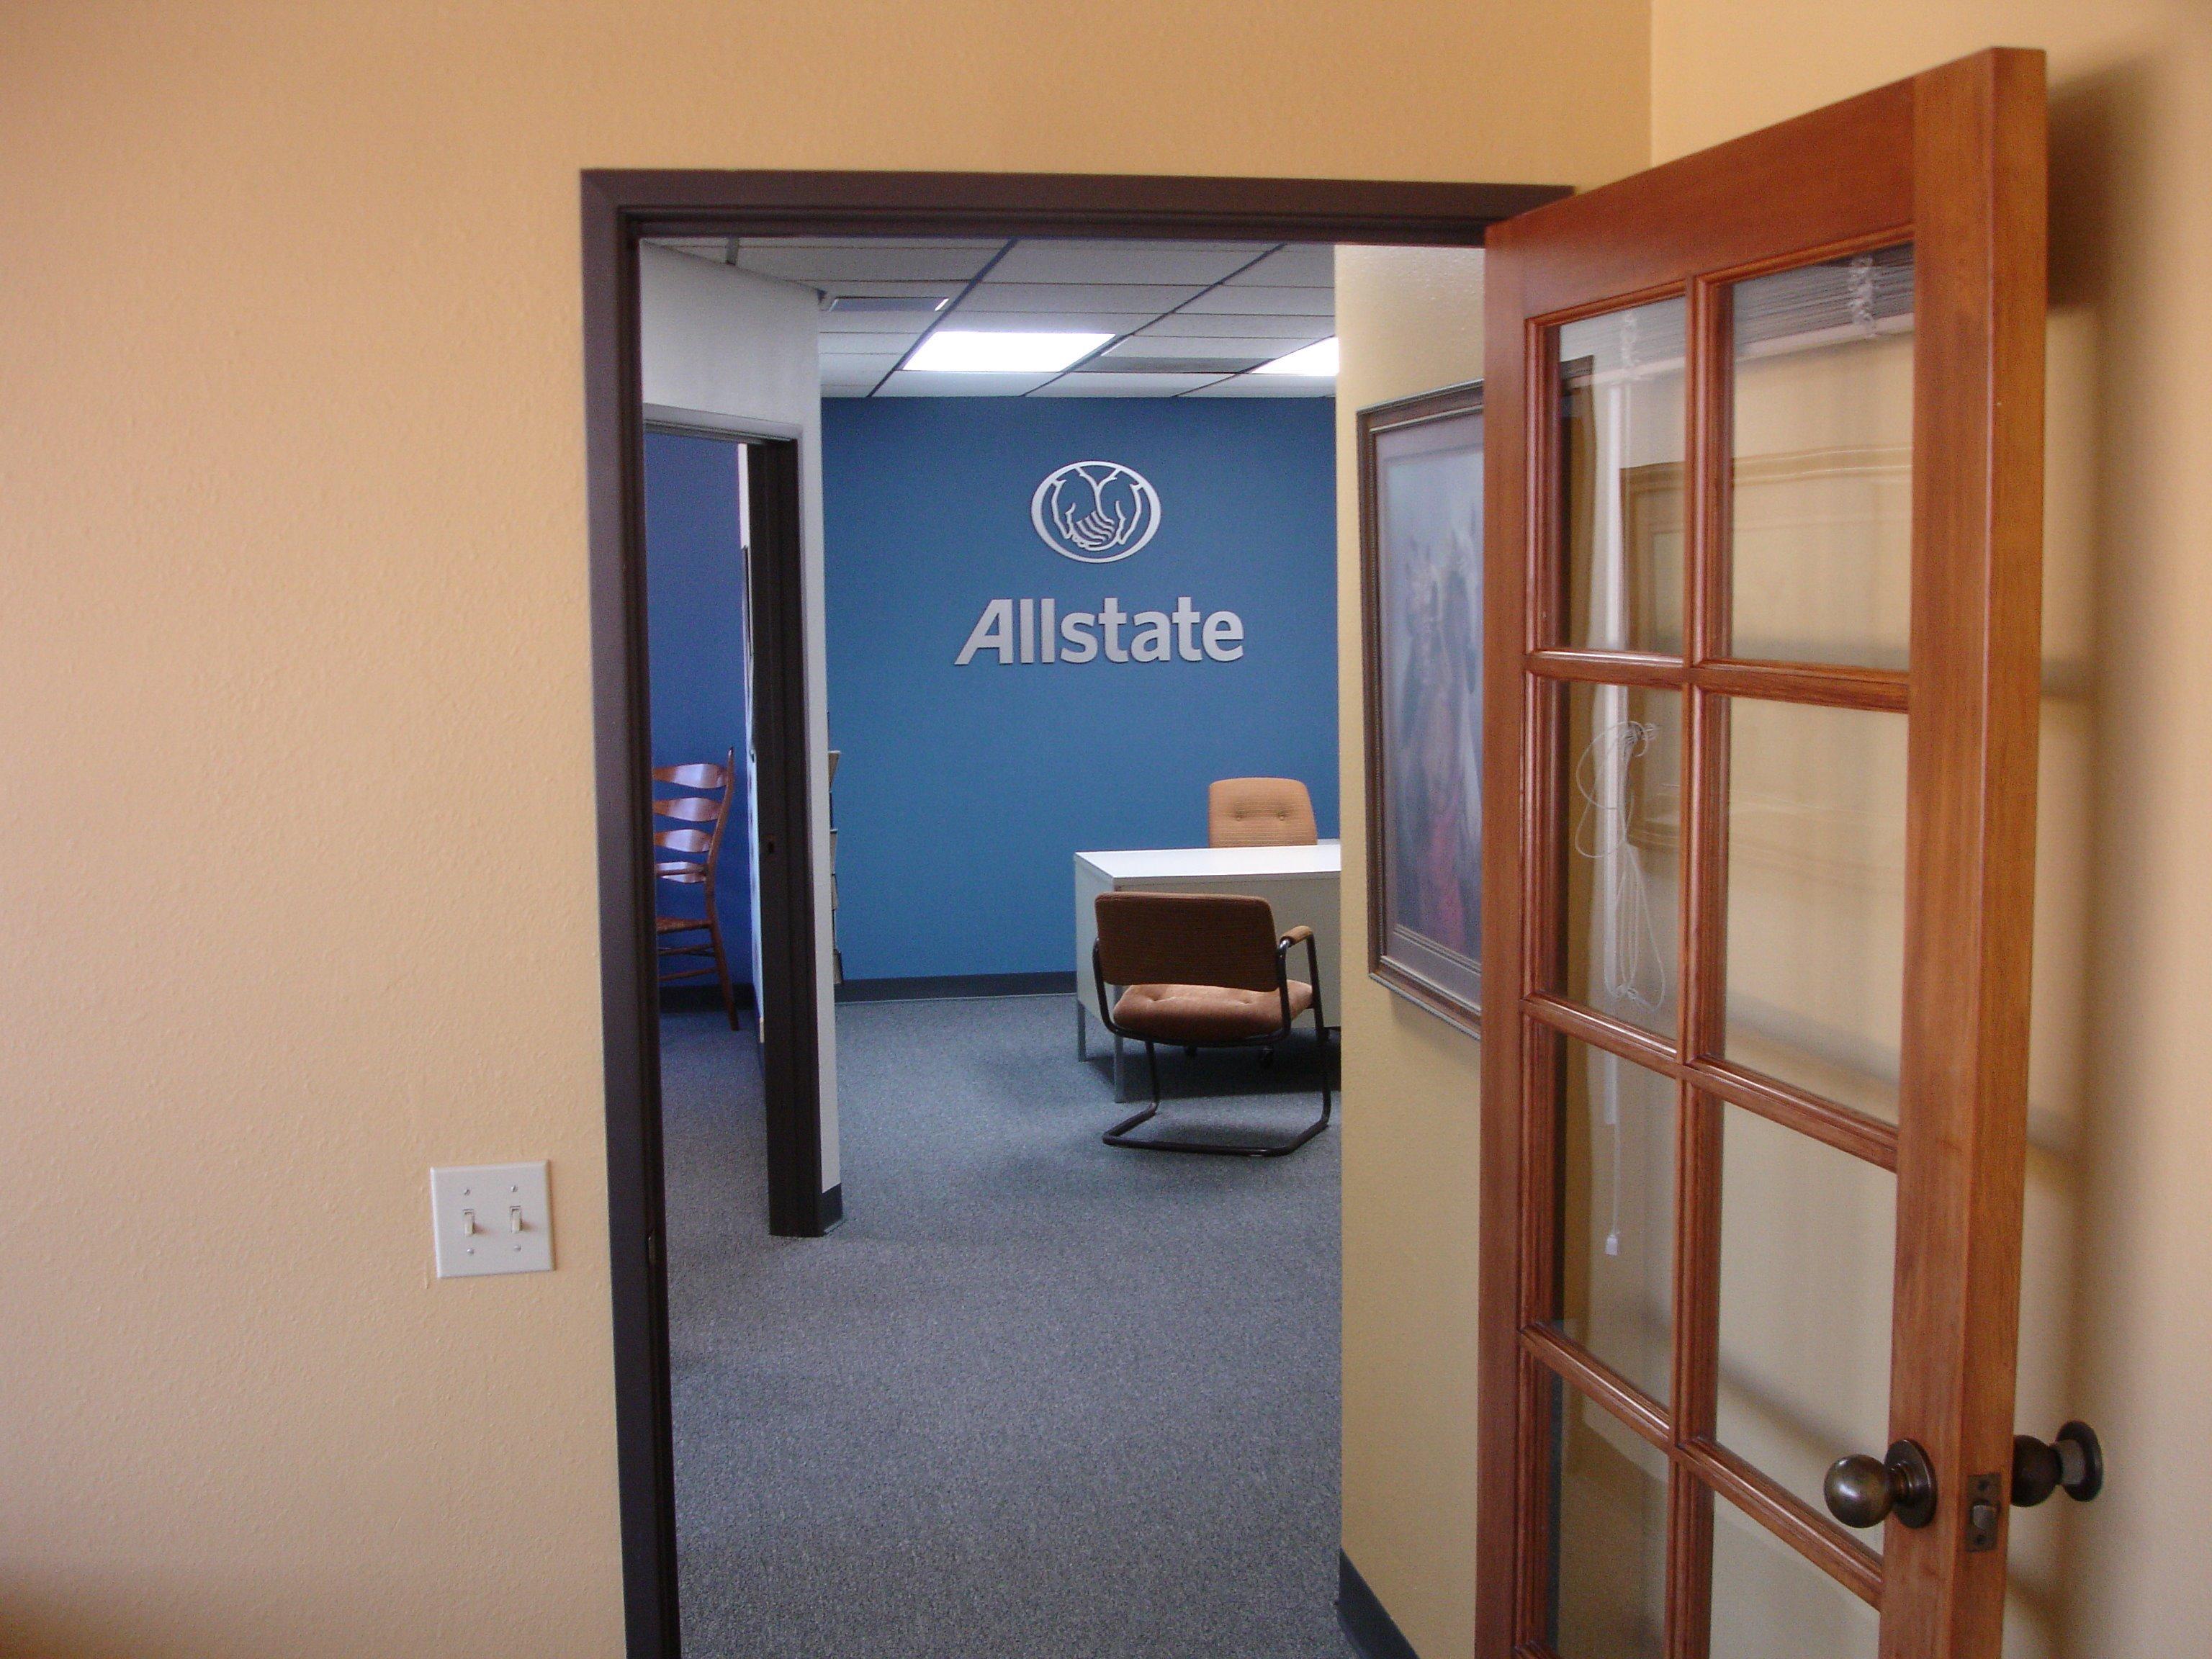 Allstate Agent In San Diego >> Allstate Insurance Agent: Jordie Fuller - San Diego, CA | agents.allstate.com/jordie-fuller-san ...